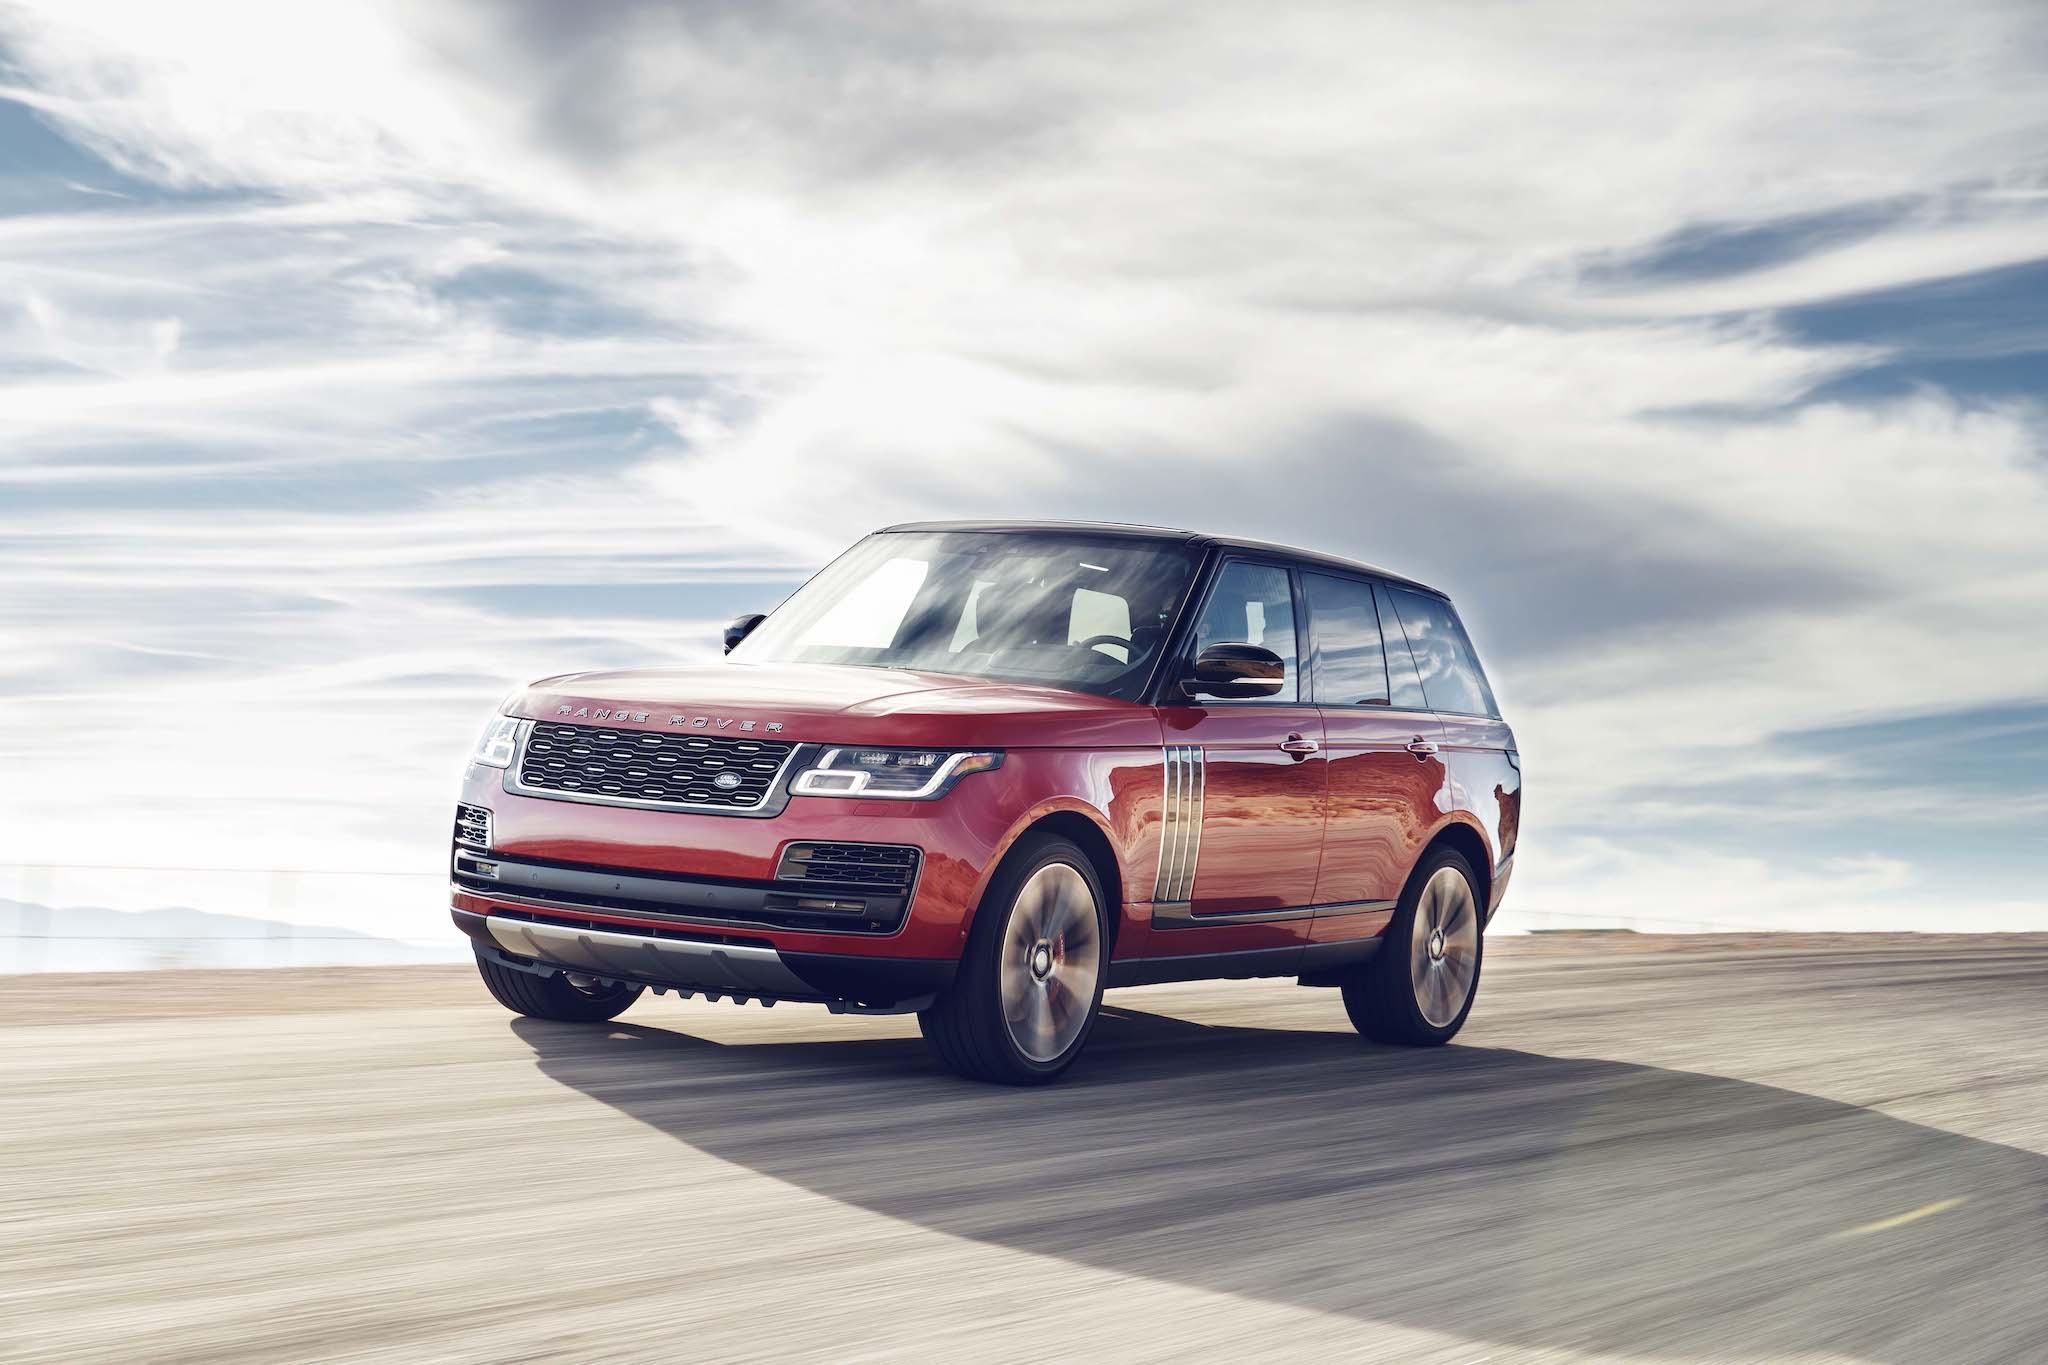 Range Rover SVAutobiography Dynamic SWB。